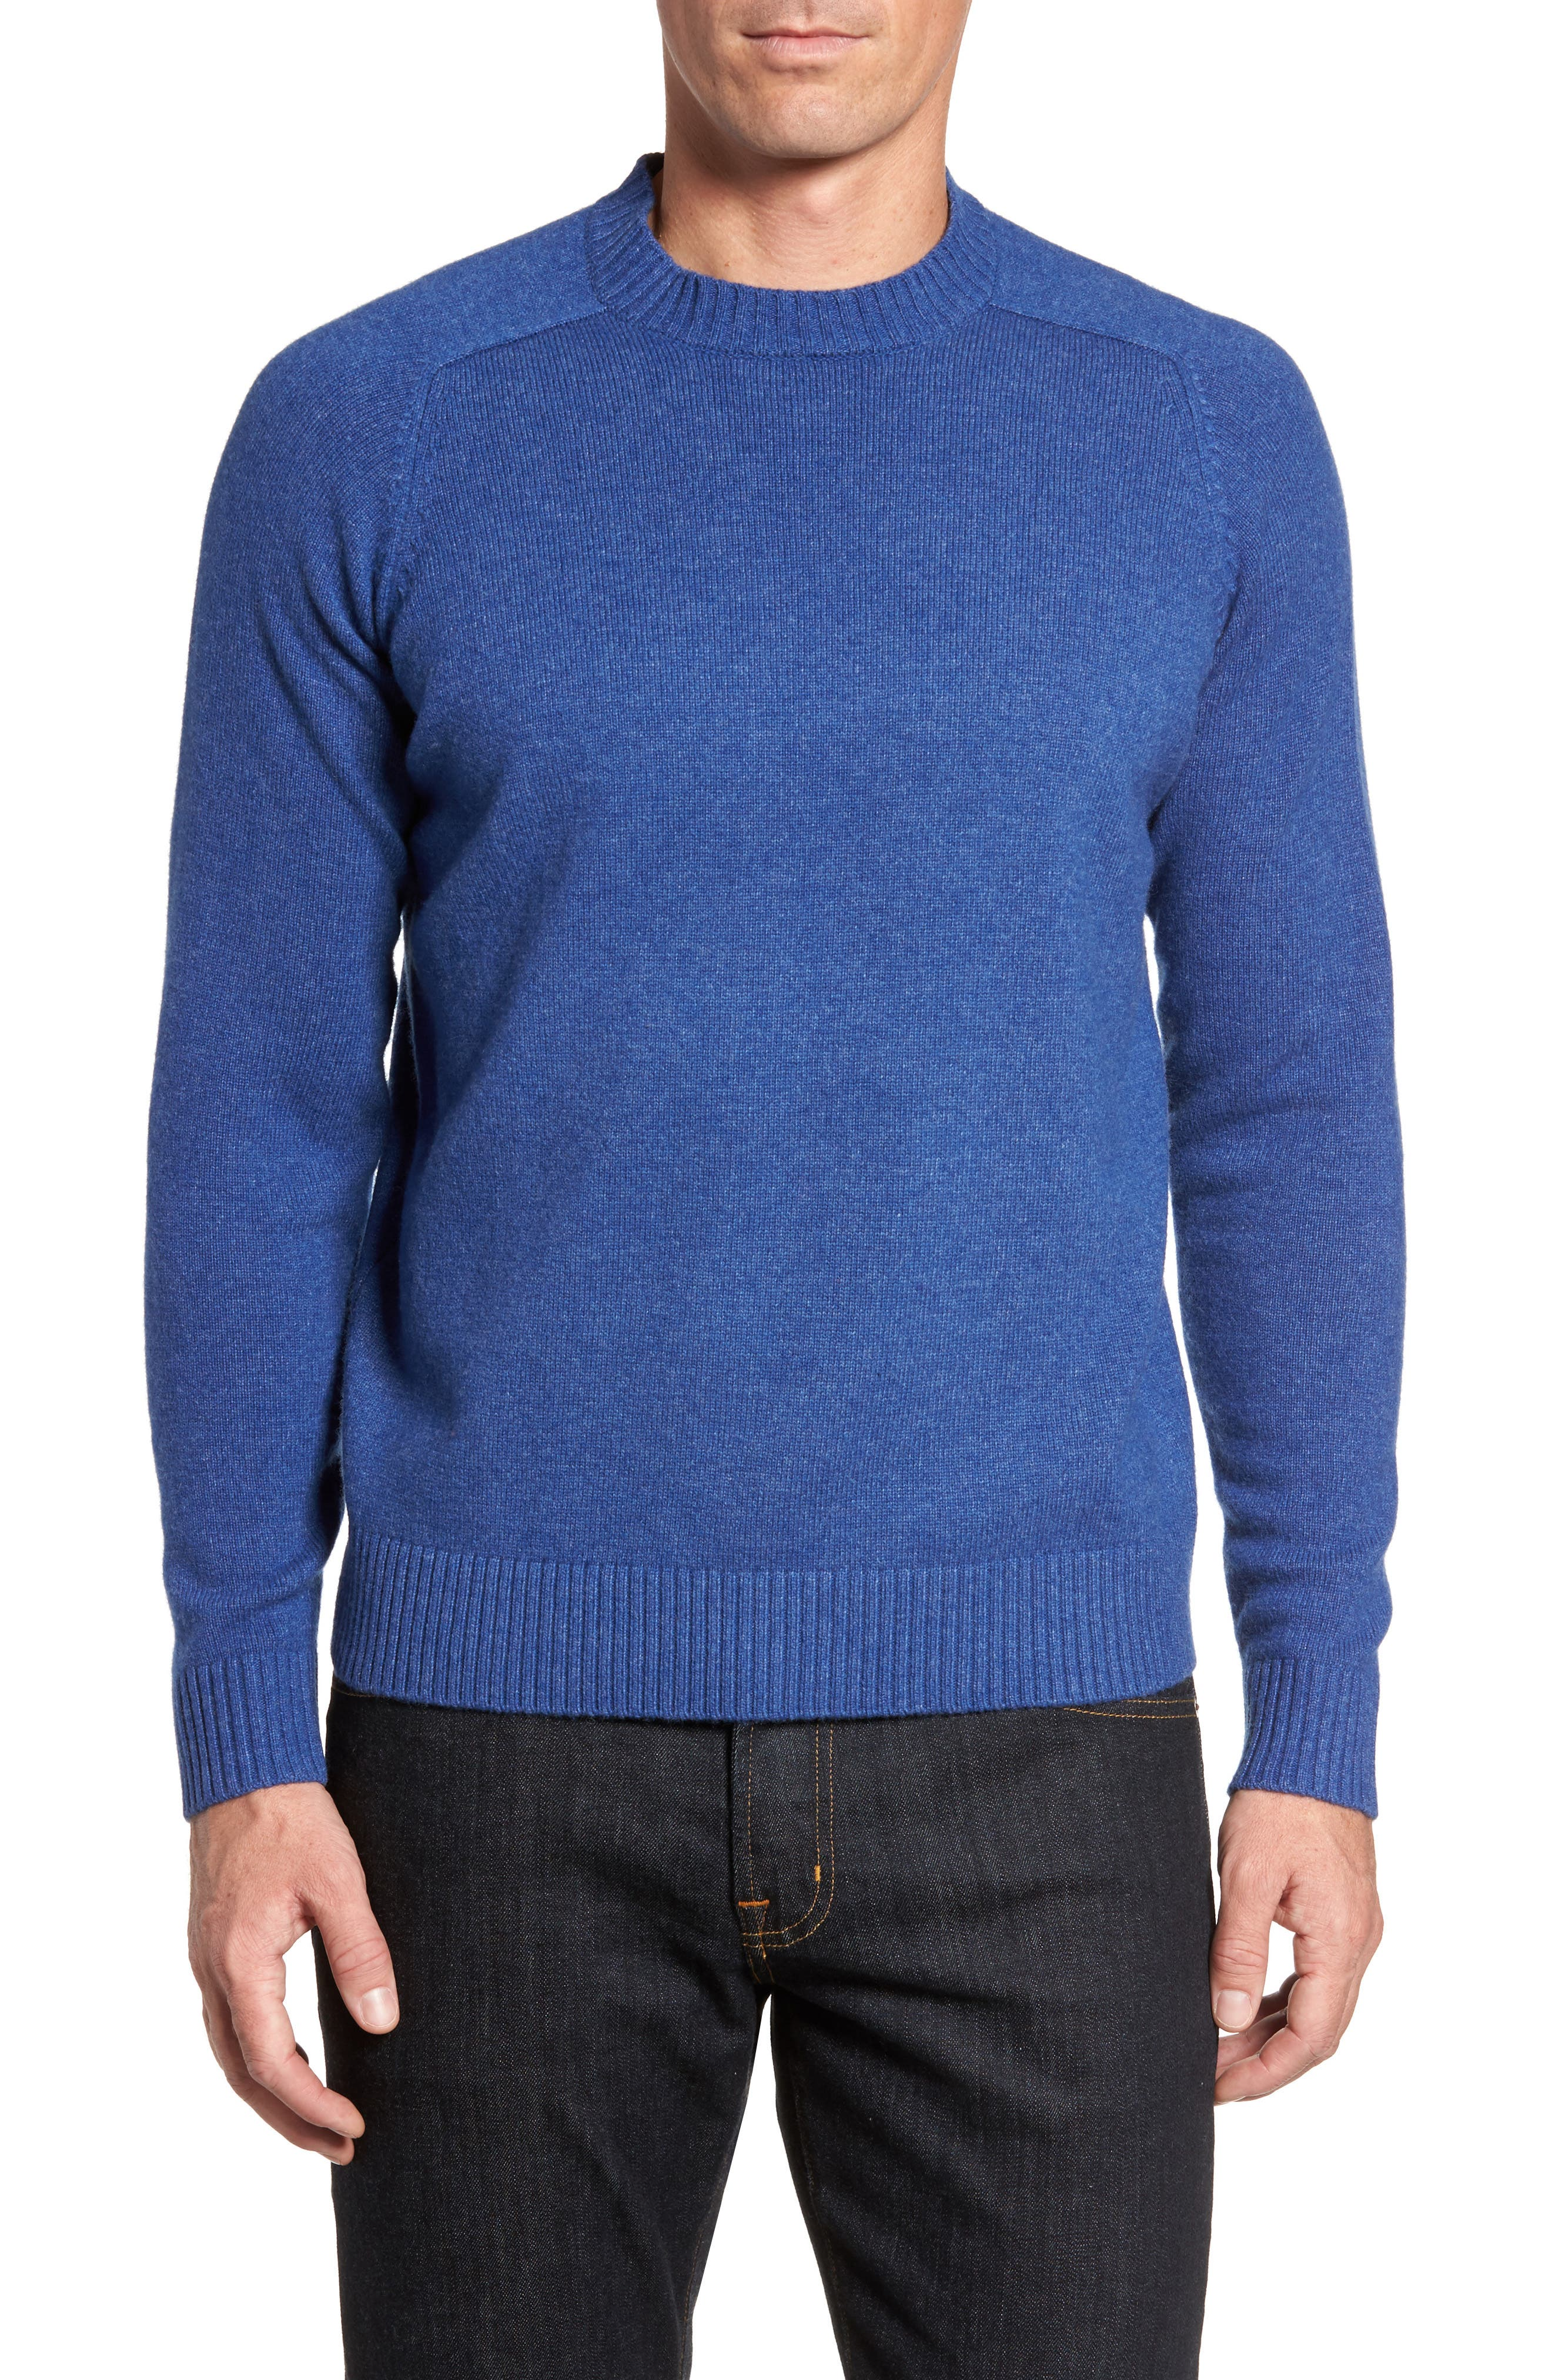 Main Image - Peter Millar Crown Vintage Crewneck Sweatshirt